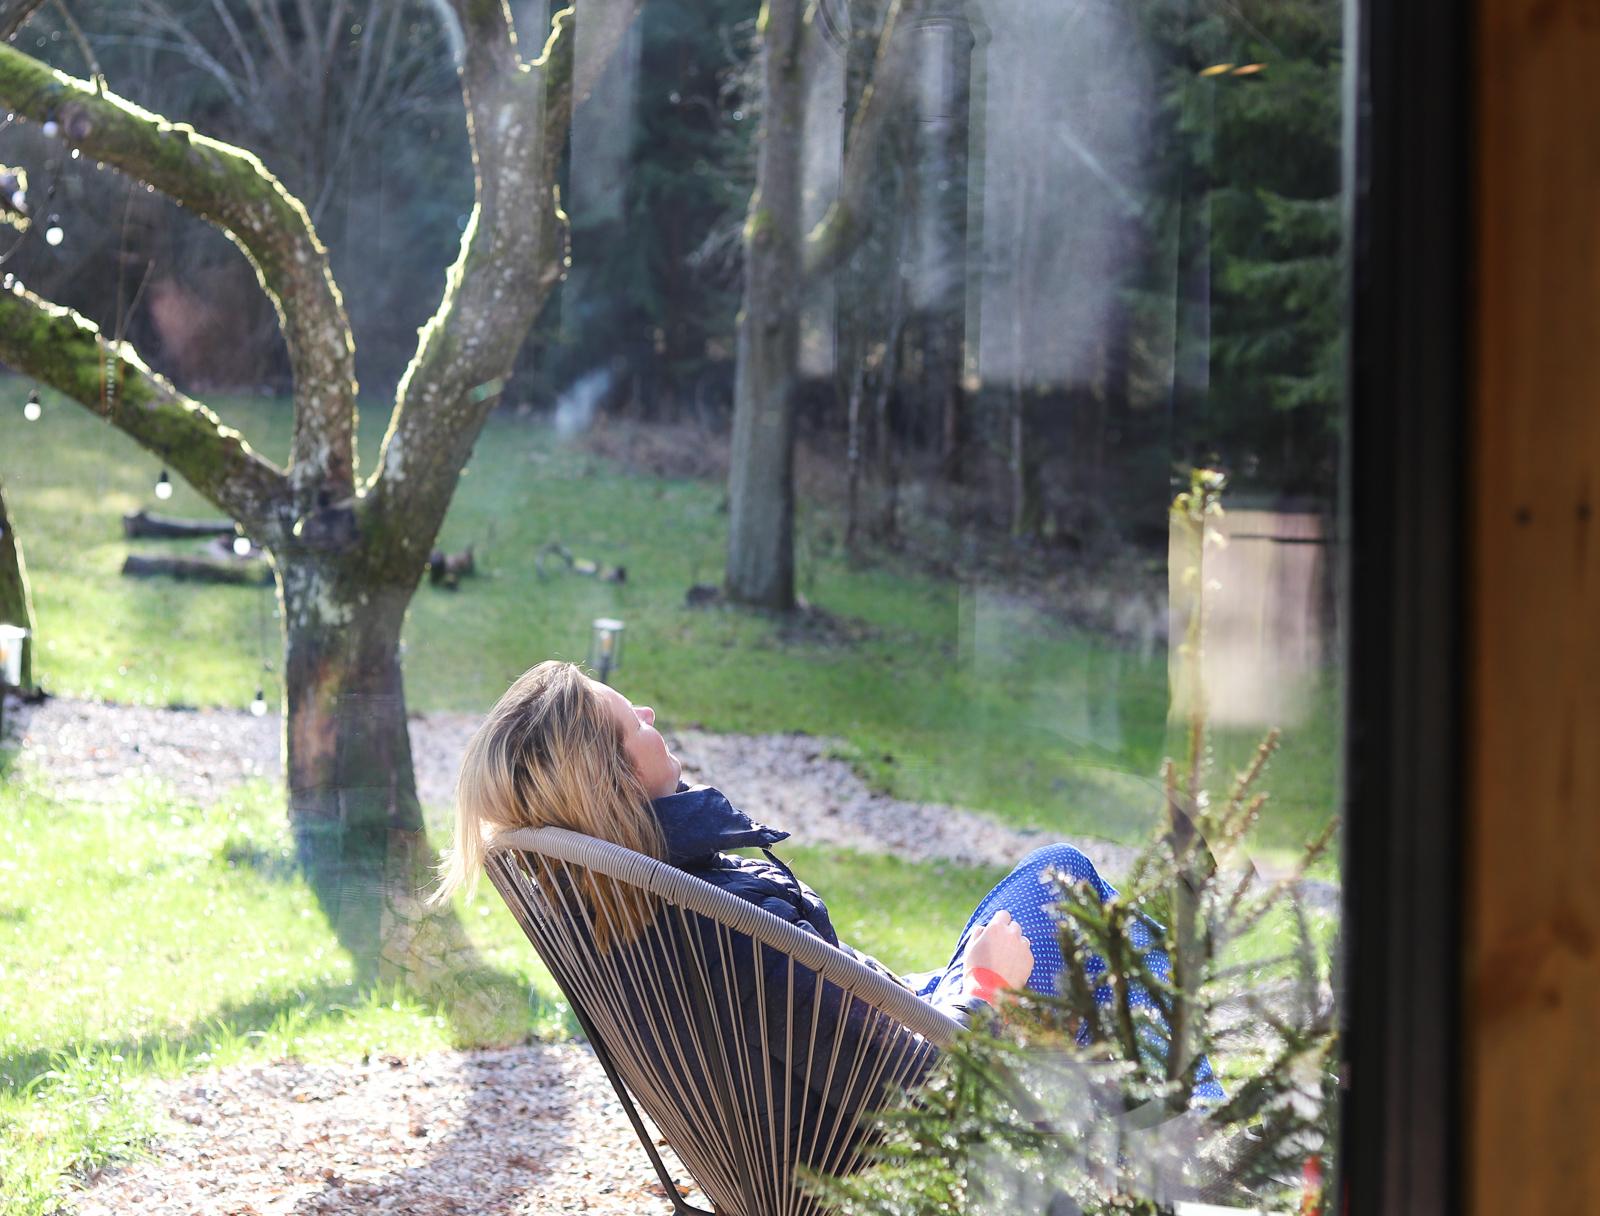 sauerwald warmia